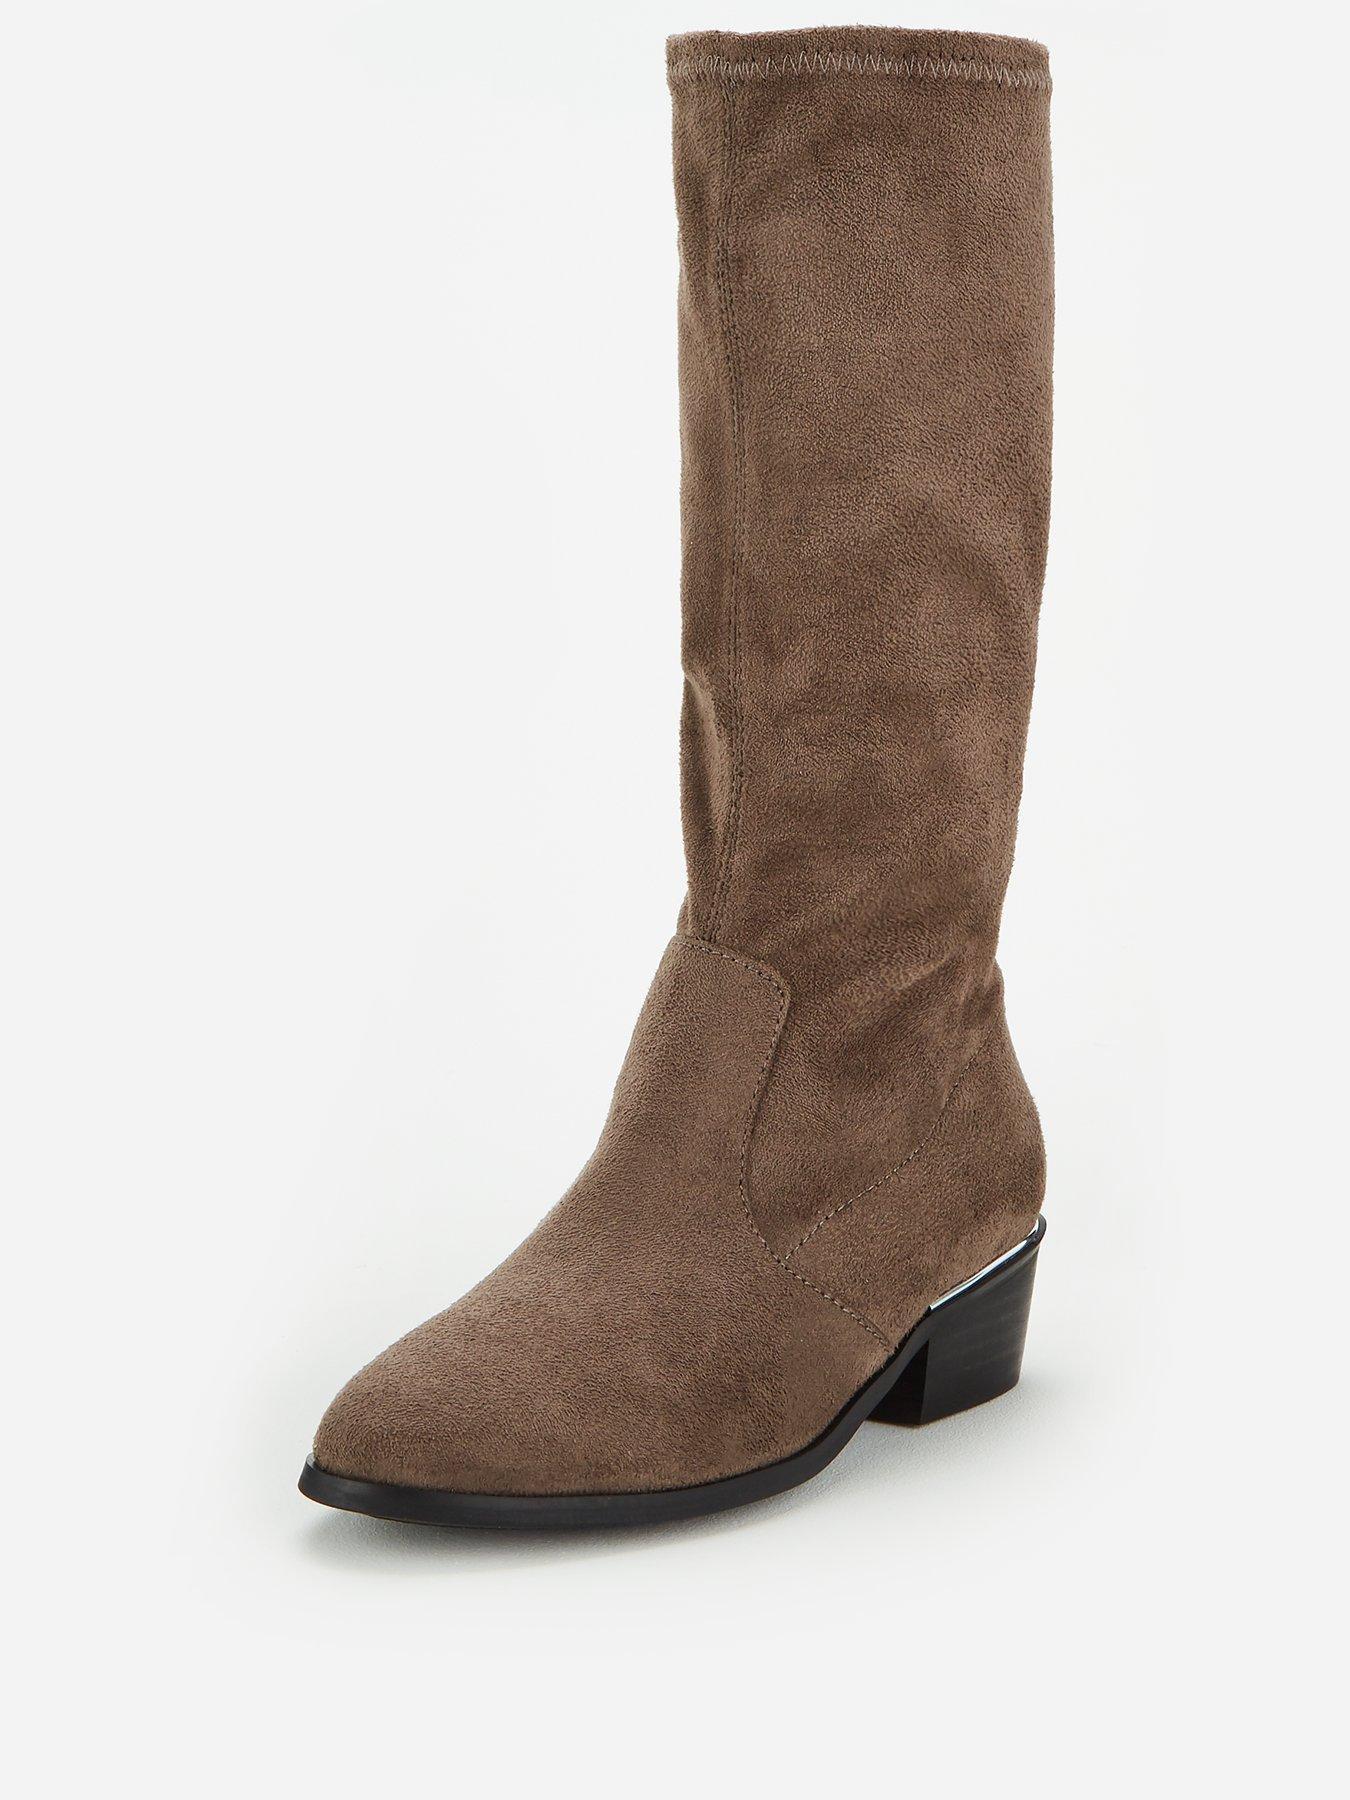 Kids Shoes \u0026 Boots For Boys \u0026 Girls